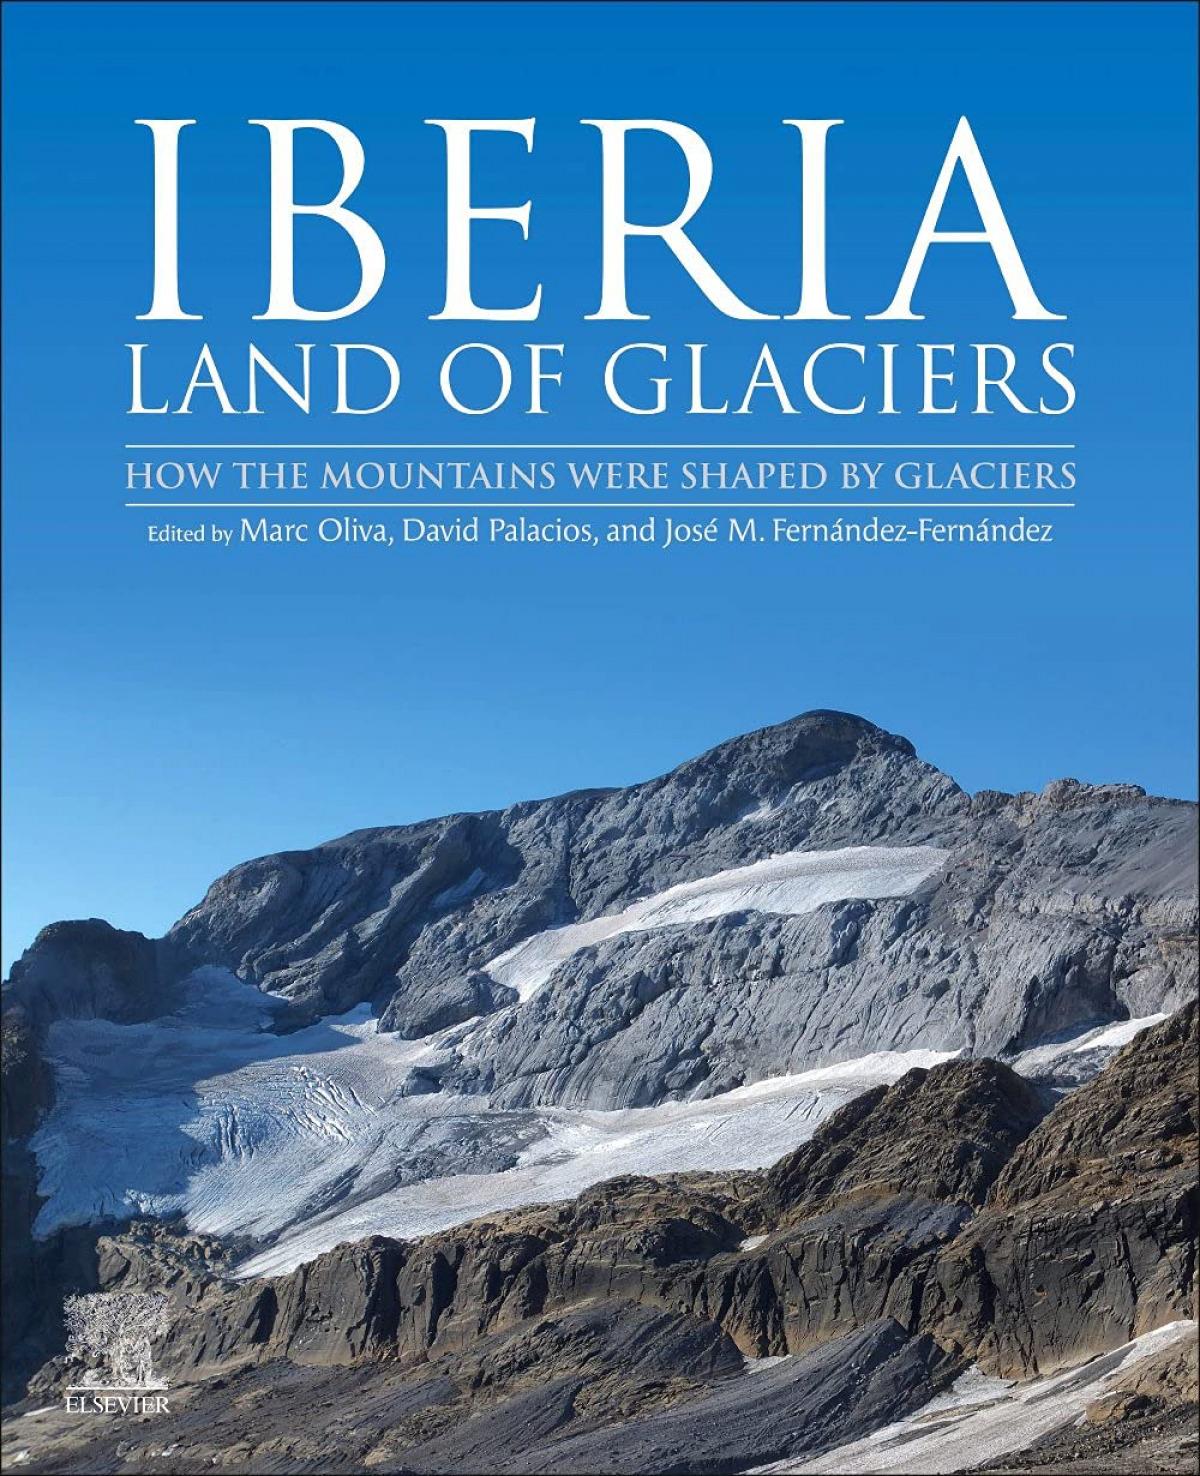 Iberia, land of glaciers